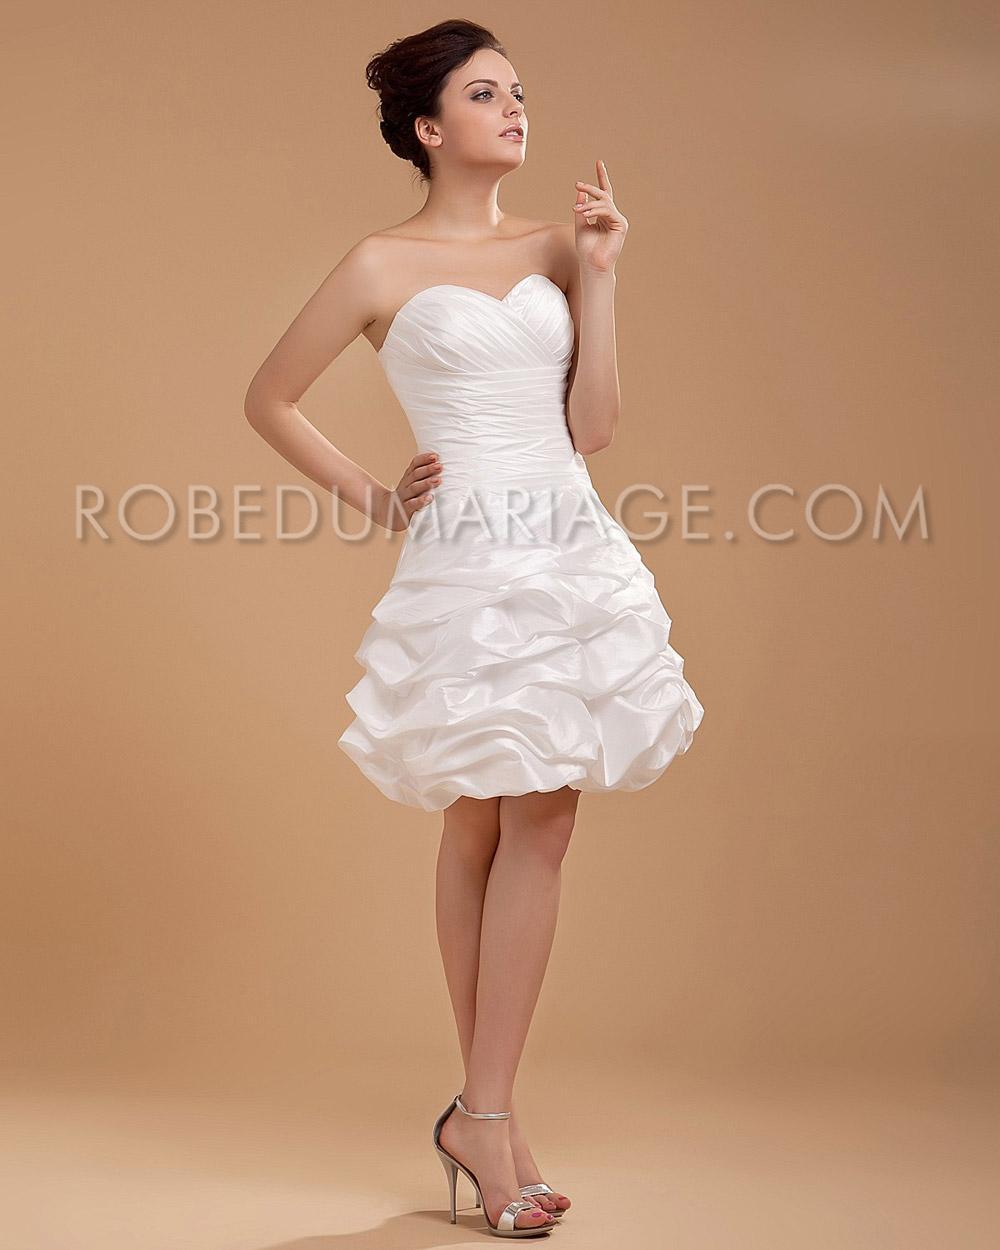 taffetas boule robe de mariage pas cher ruches robe206464. Black Bedroom Furniture Sets. Home Design Ideas